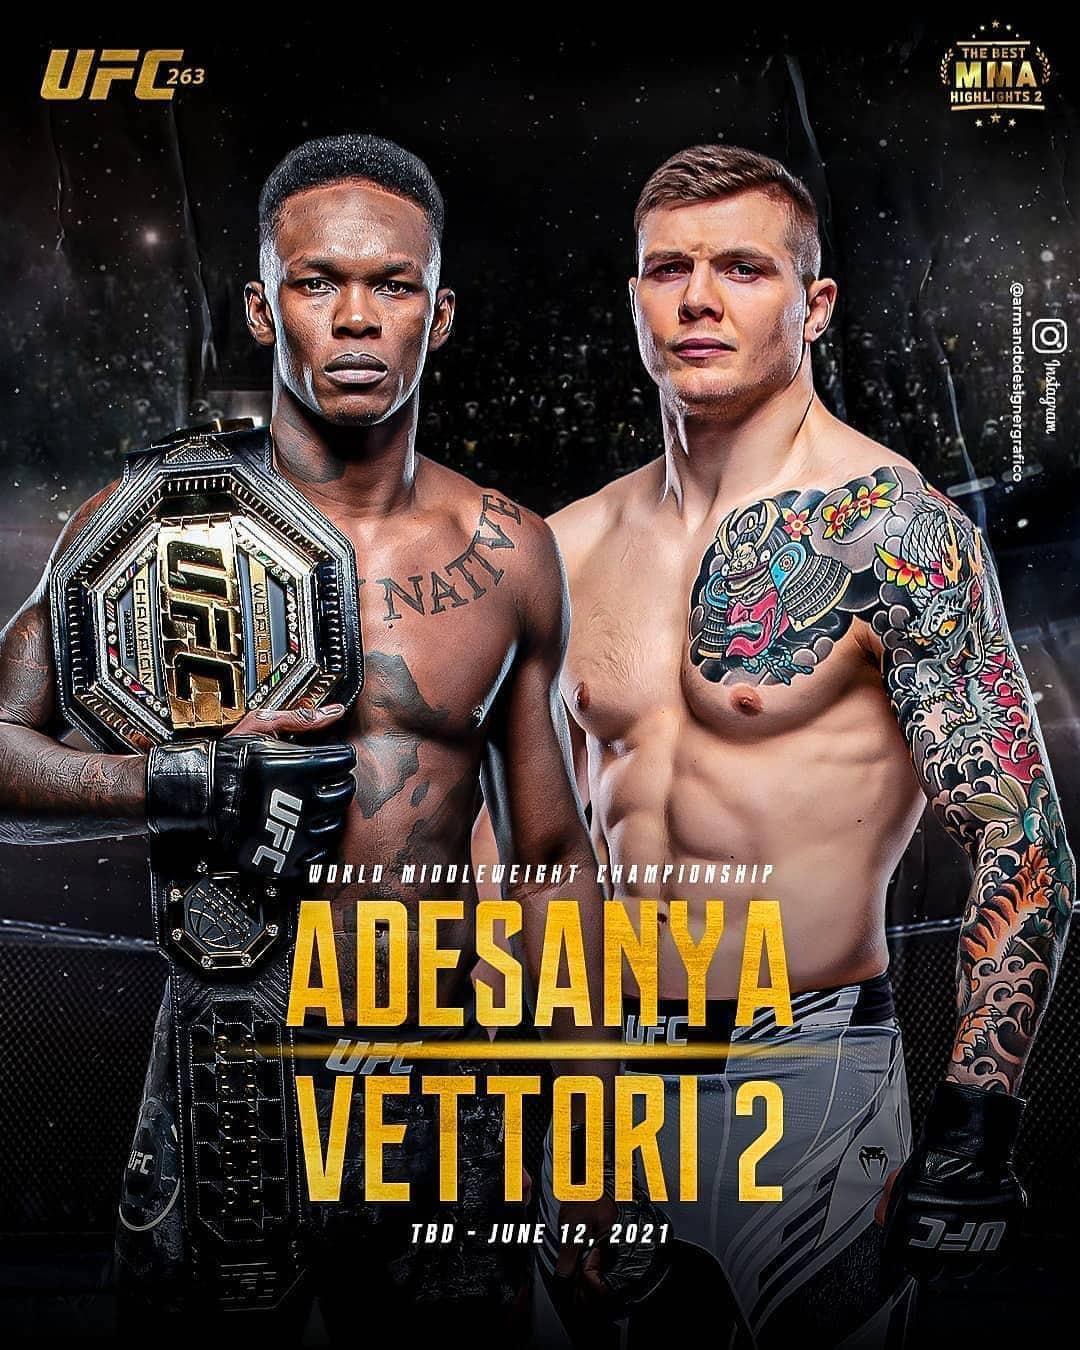 UFC 263: Adesanya vs Vettori 2 2